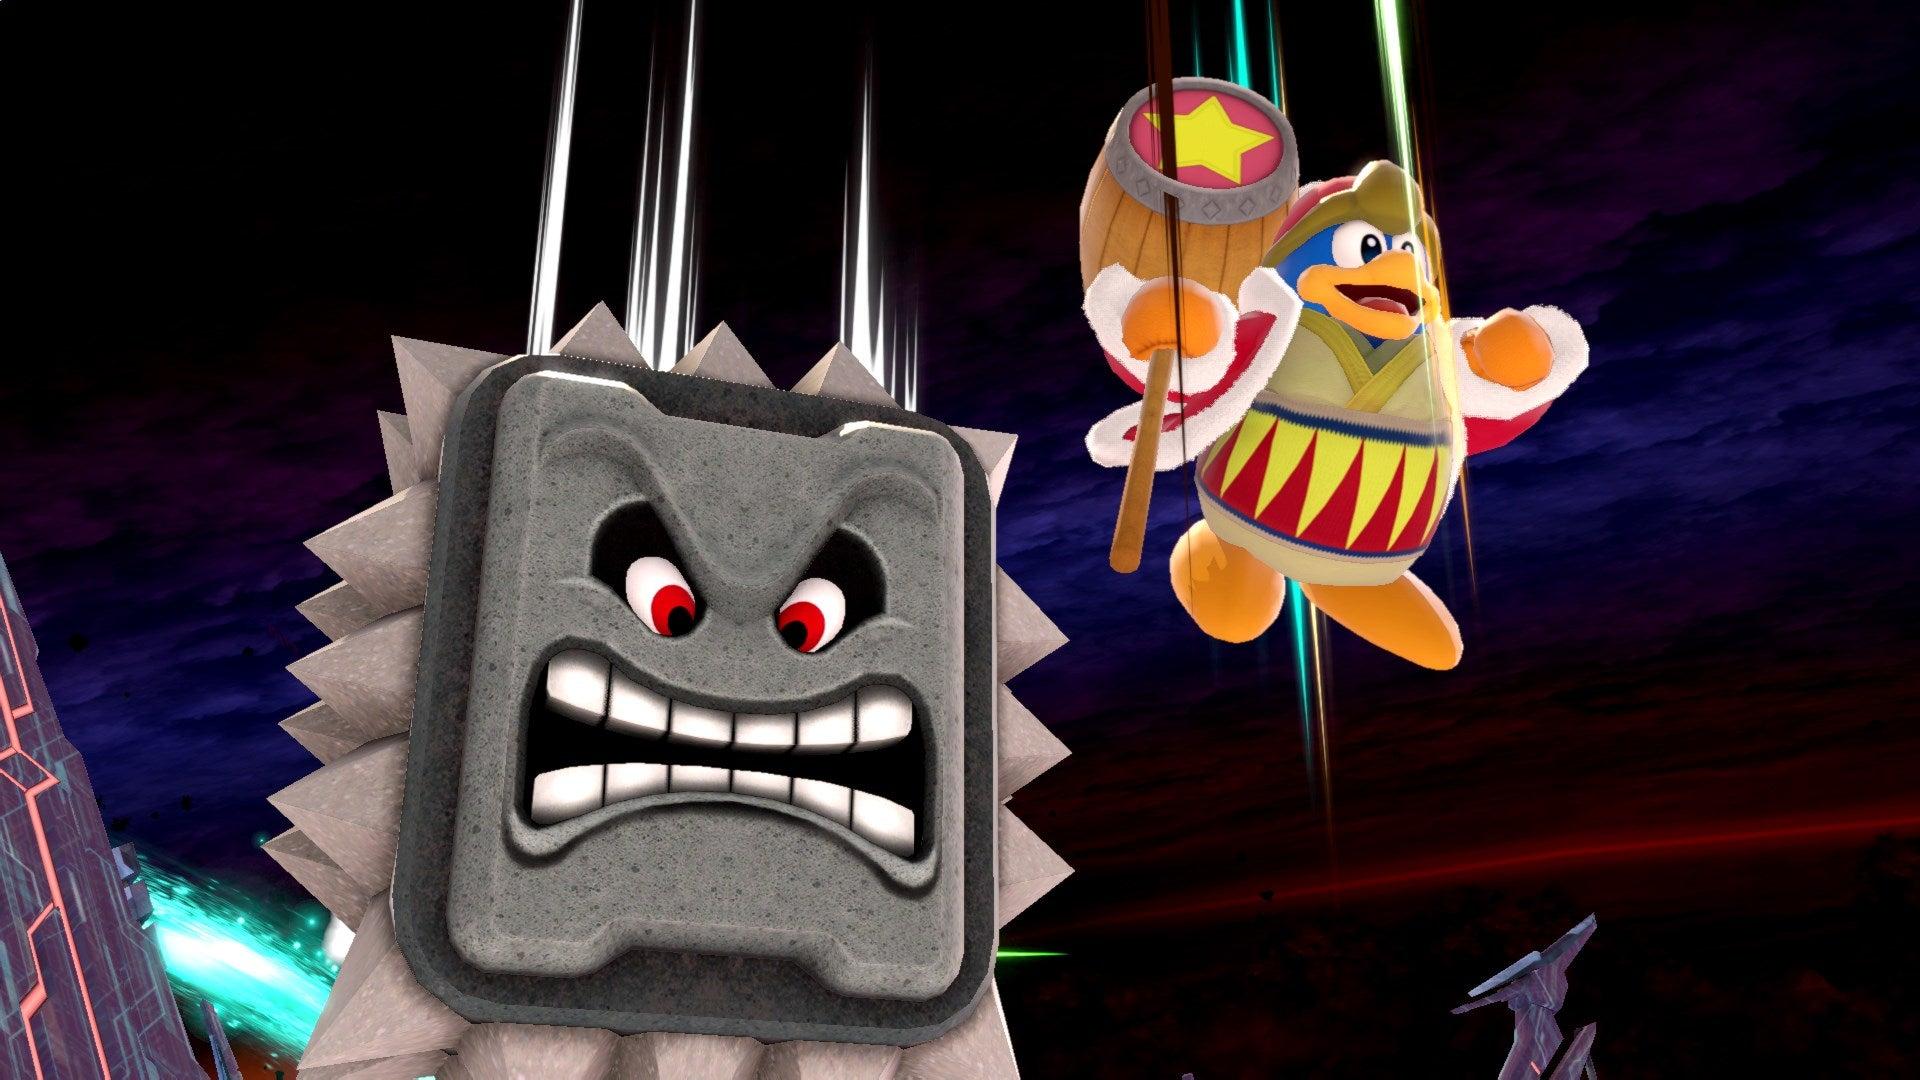 Image for Super Smash Bros. Ultimate: Smash World, Adventure Mode, assist trophies, online, matchmaking, more